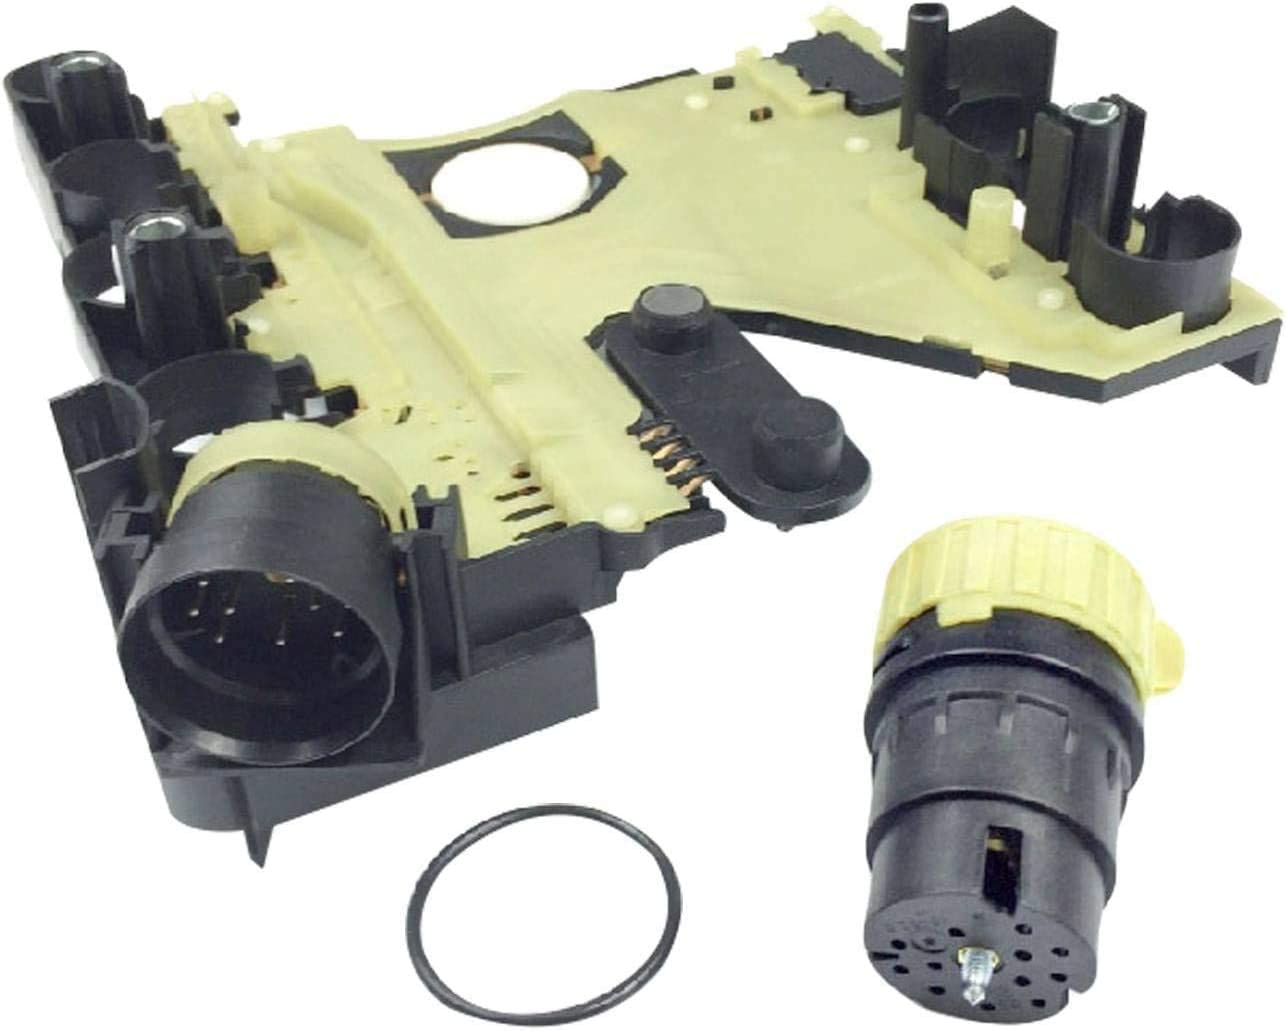 Spidan 26214 kit de fuelle protector para eje de transmisi/ón